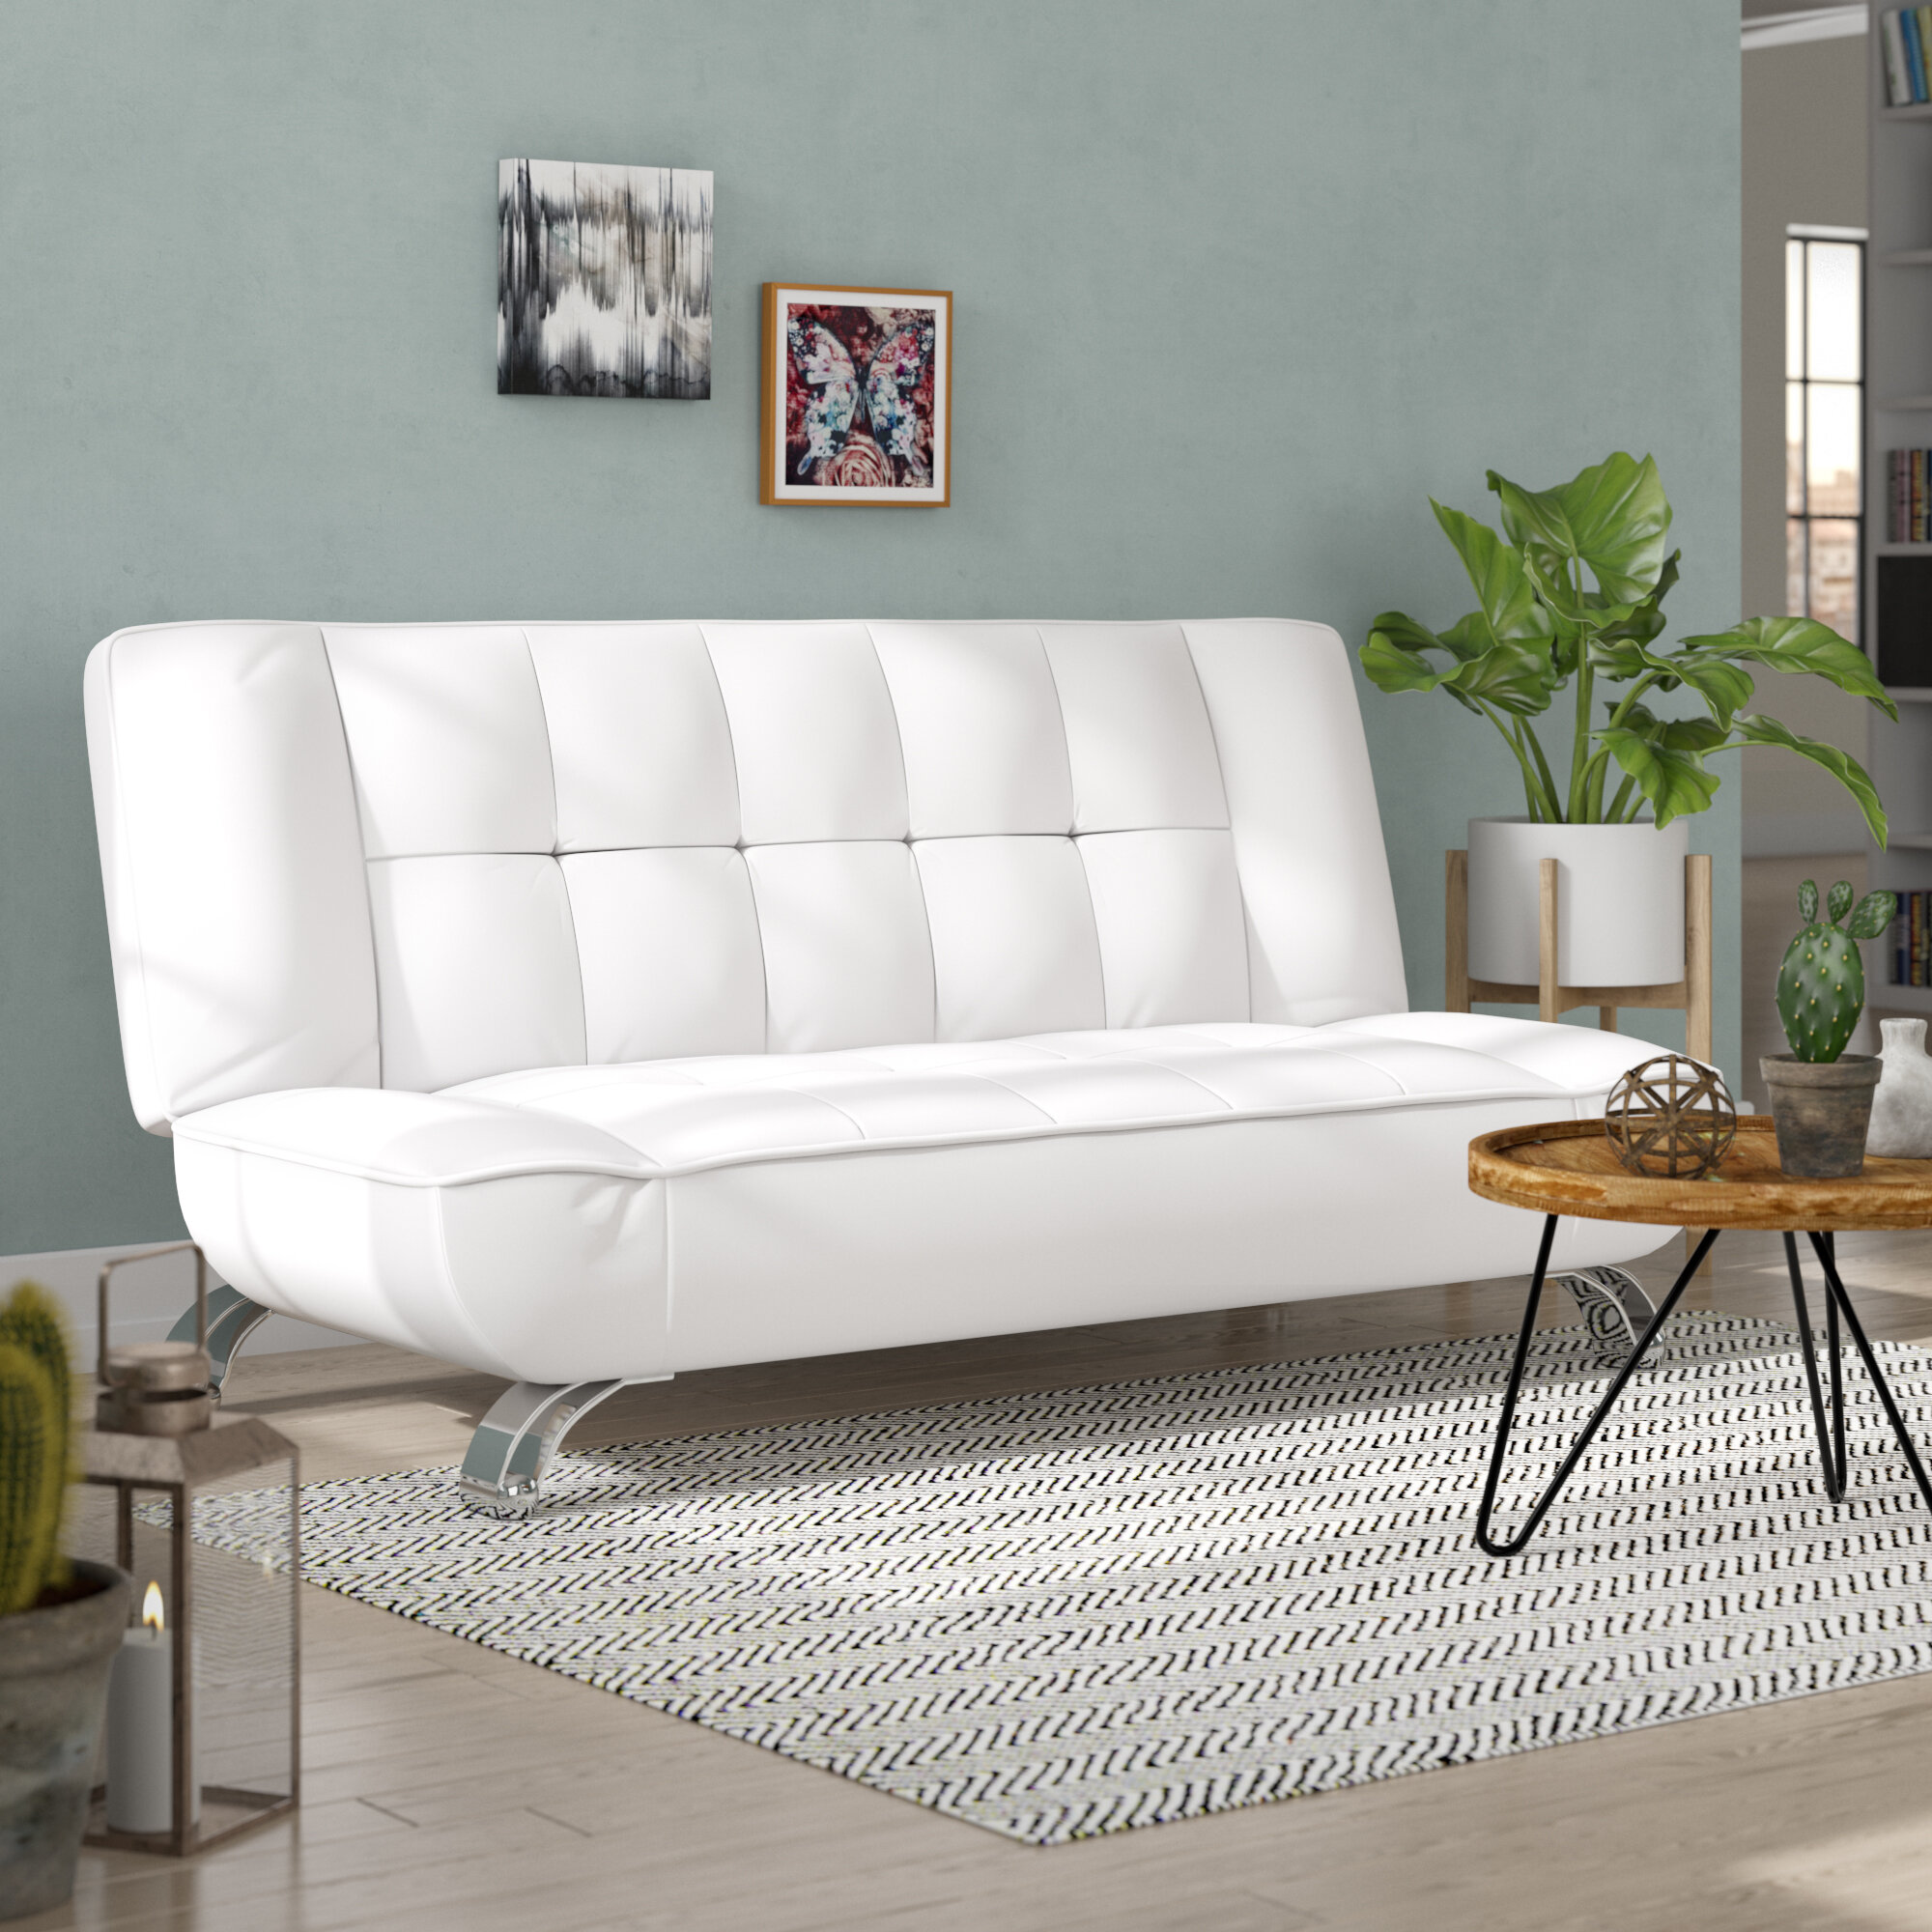 Orren Ellis Barresi 3 Seater Clic Clac Sofa Bed Reviews Wayfair Co Uk